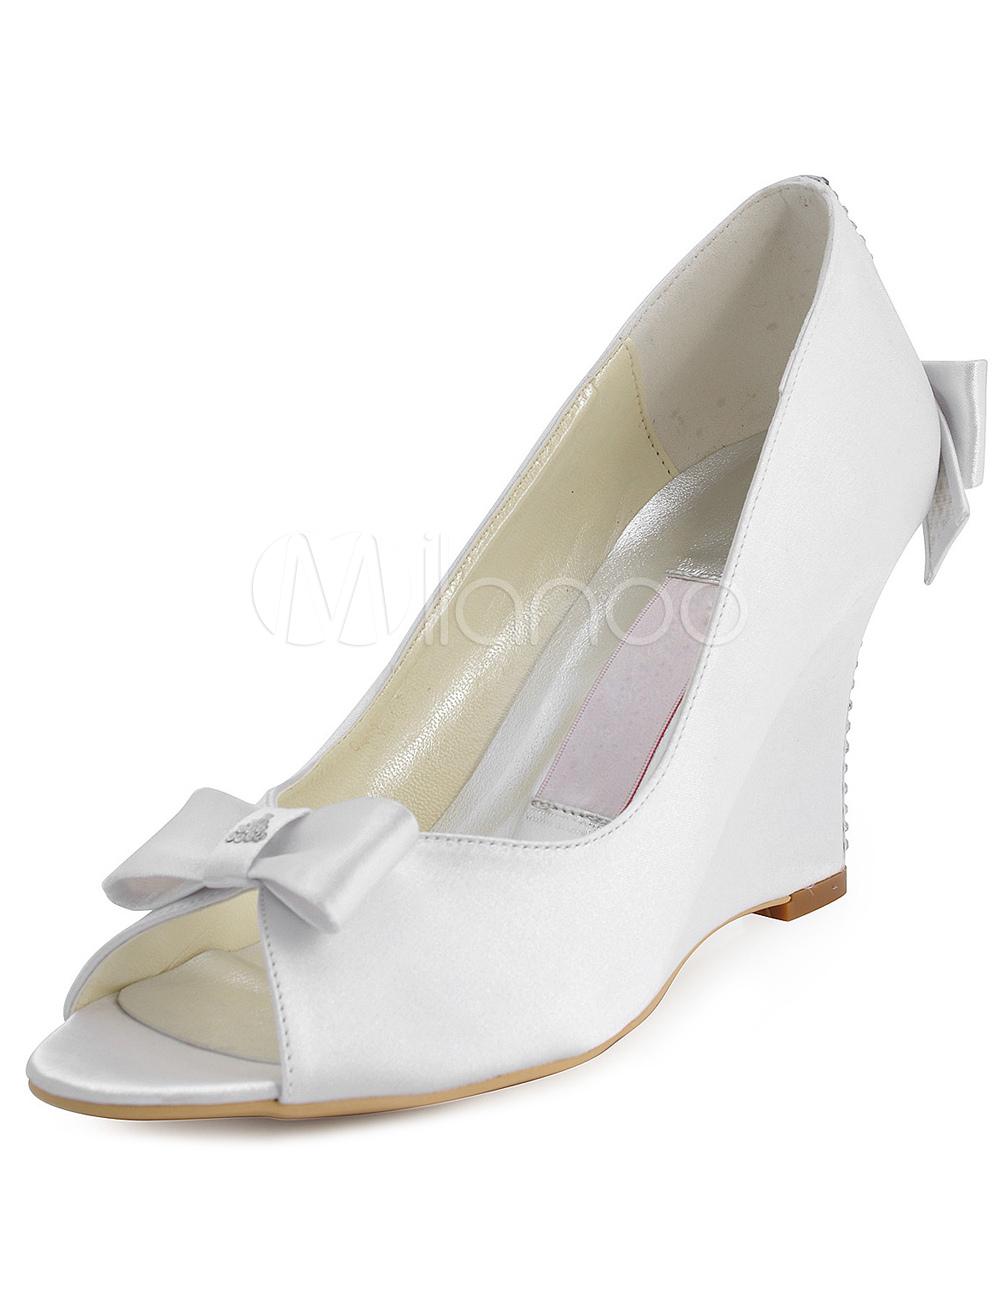 talon compens chaussures de mariage - Chaussure Compense Mariage